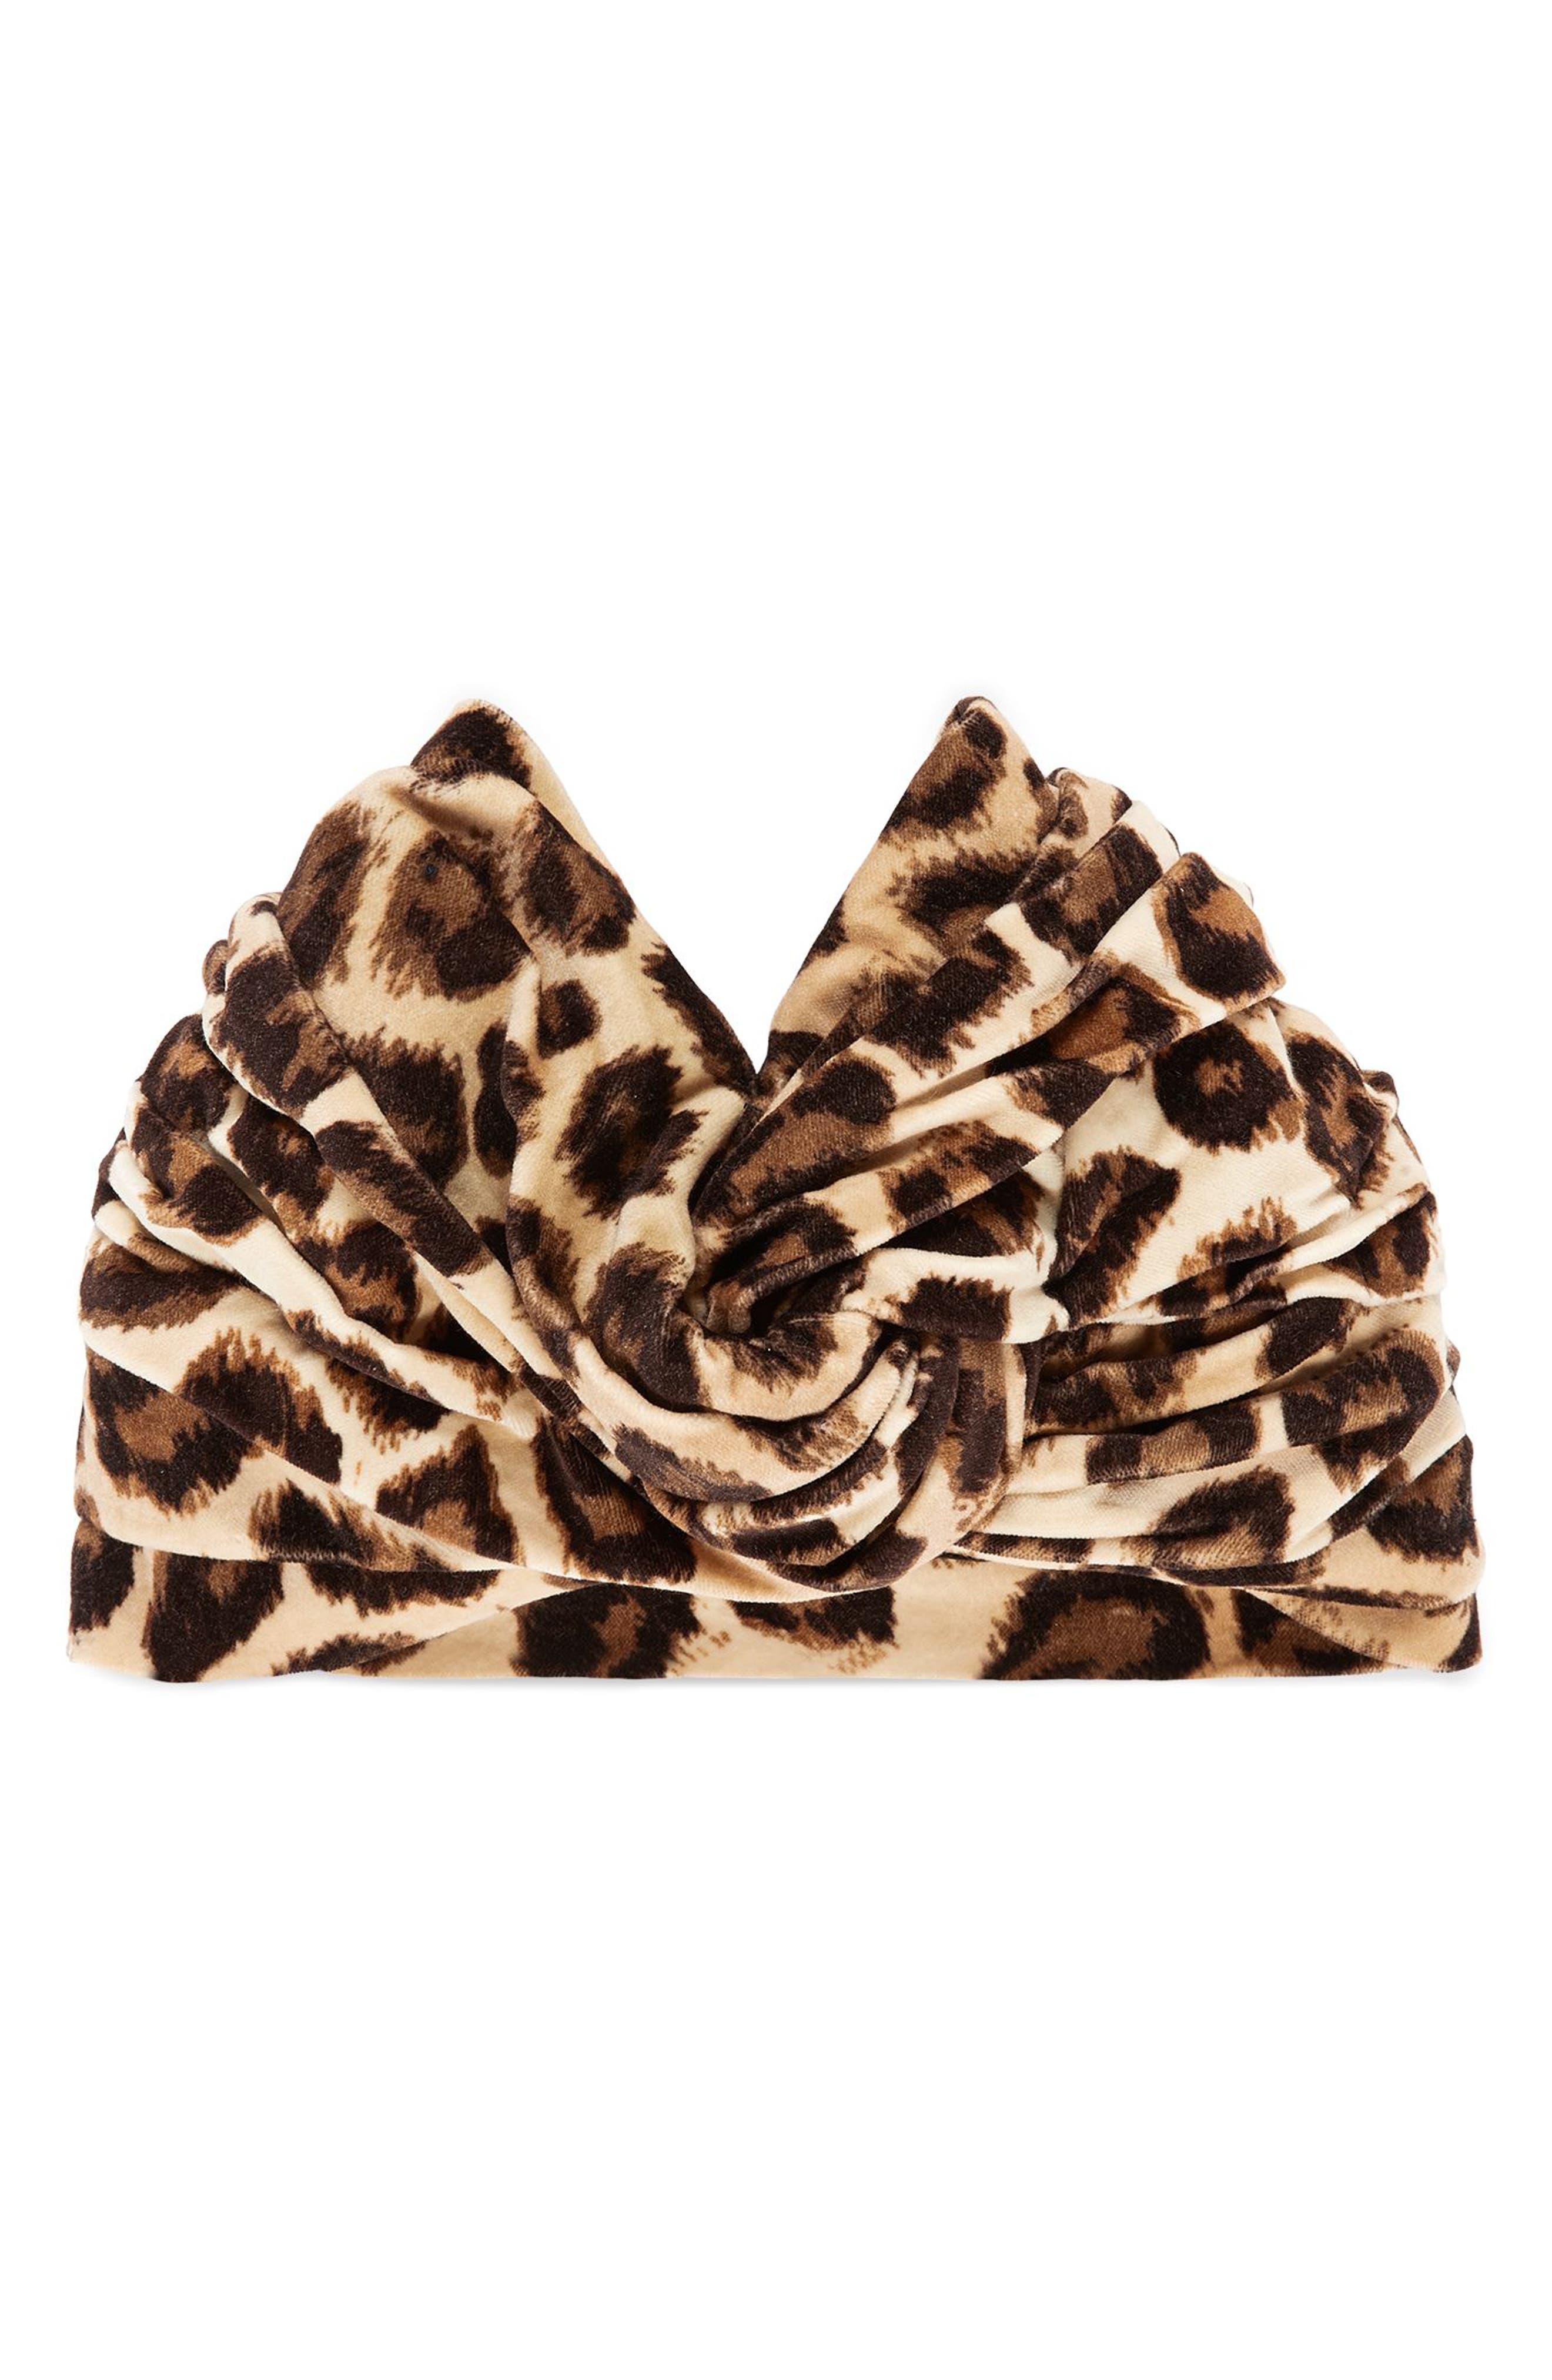 Lucileo Leopard Velvet Turban Headband,                         Main,                         color, 287